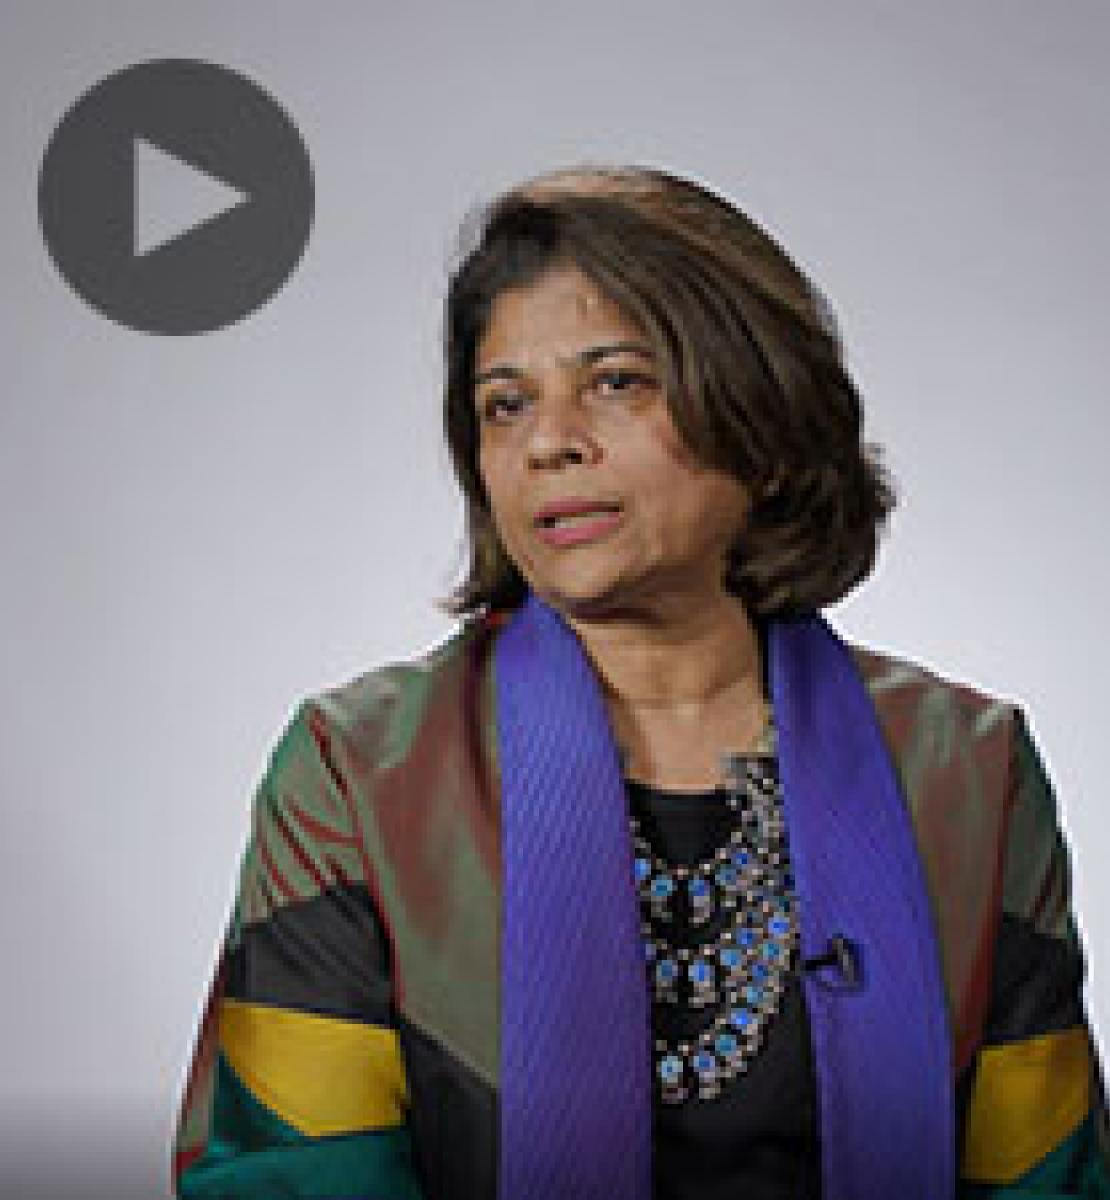 Screenshot from video message shows Resident Coordinator, Pratibha Mehta